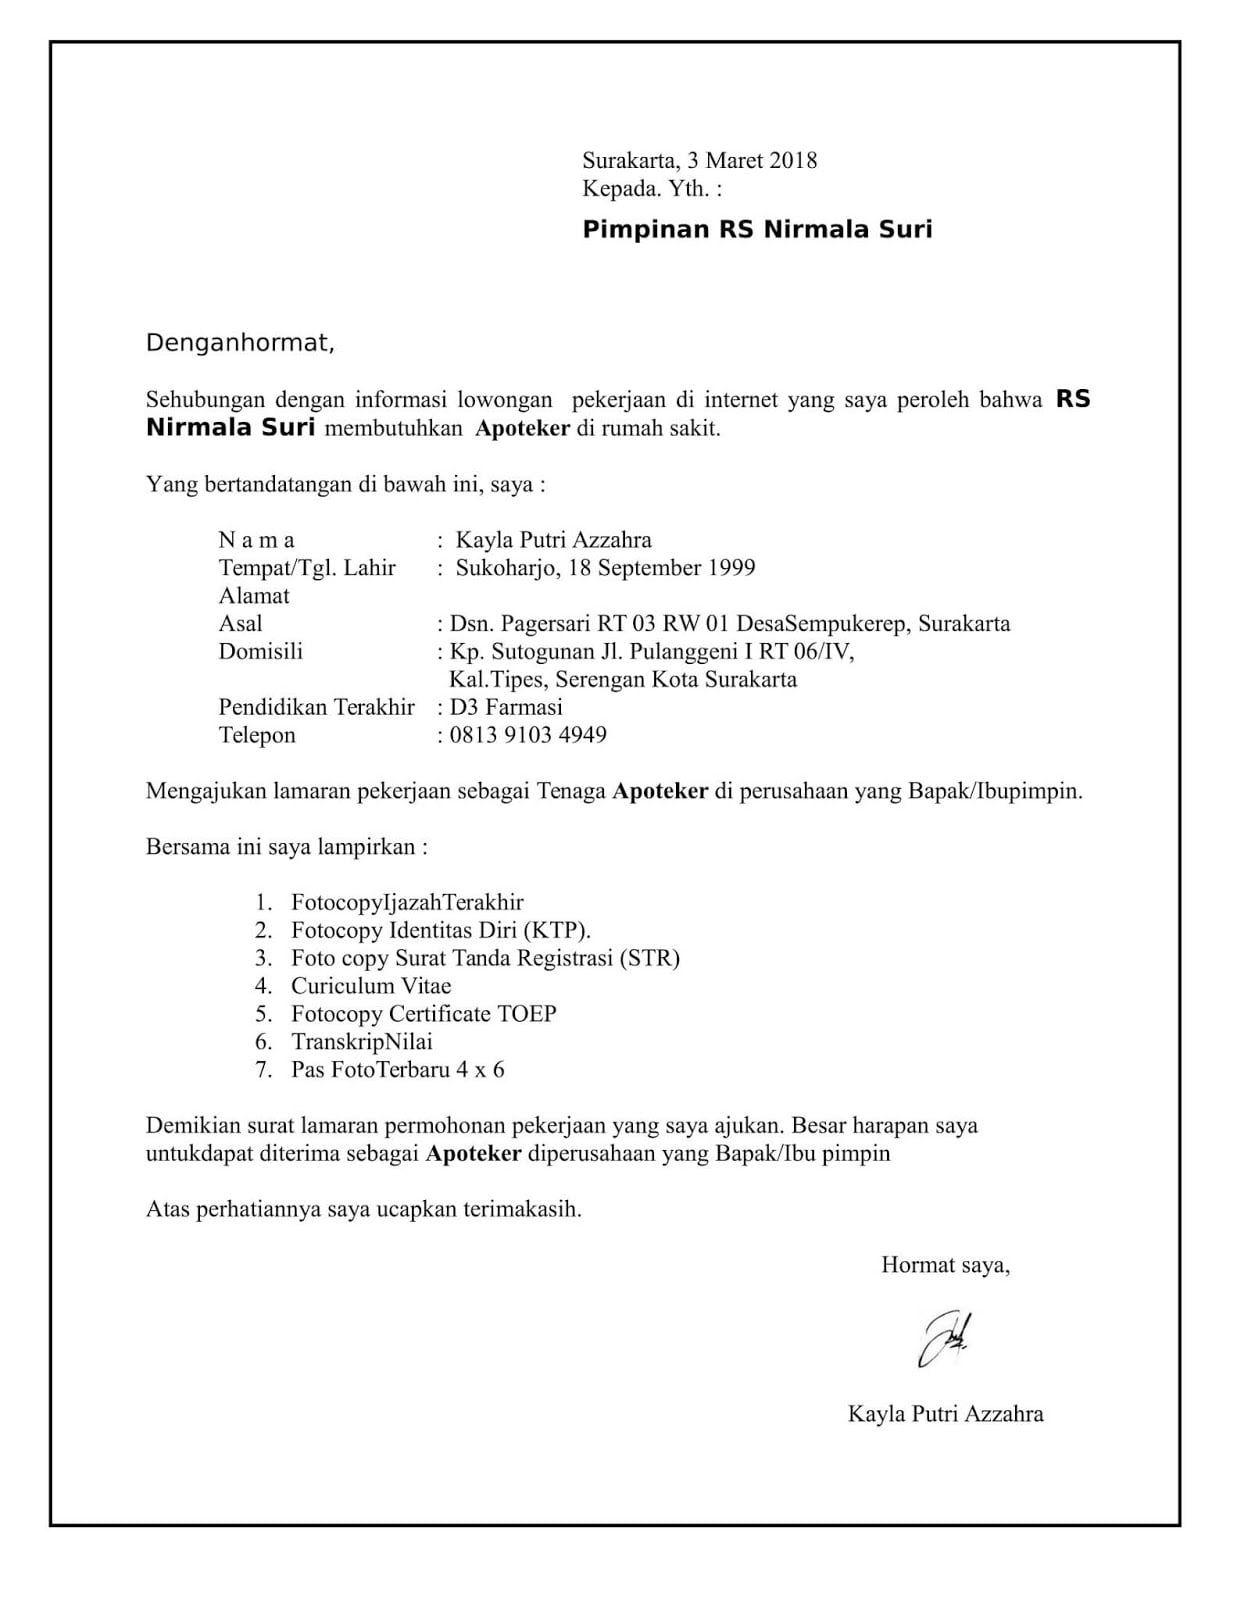 Contoh Surat Lamaran Kerja Rekam Medis Surat Medis Pimpinan